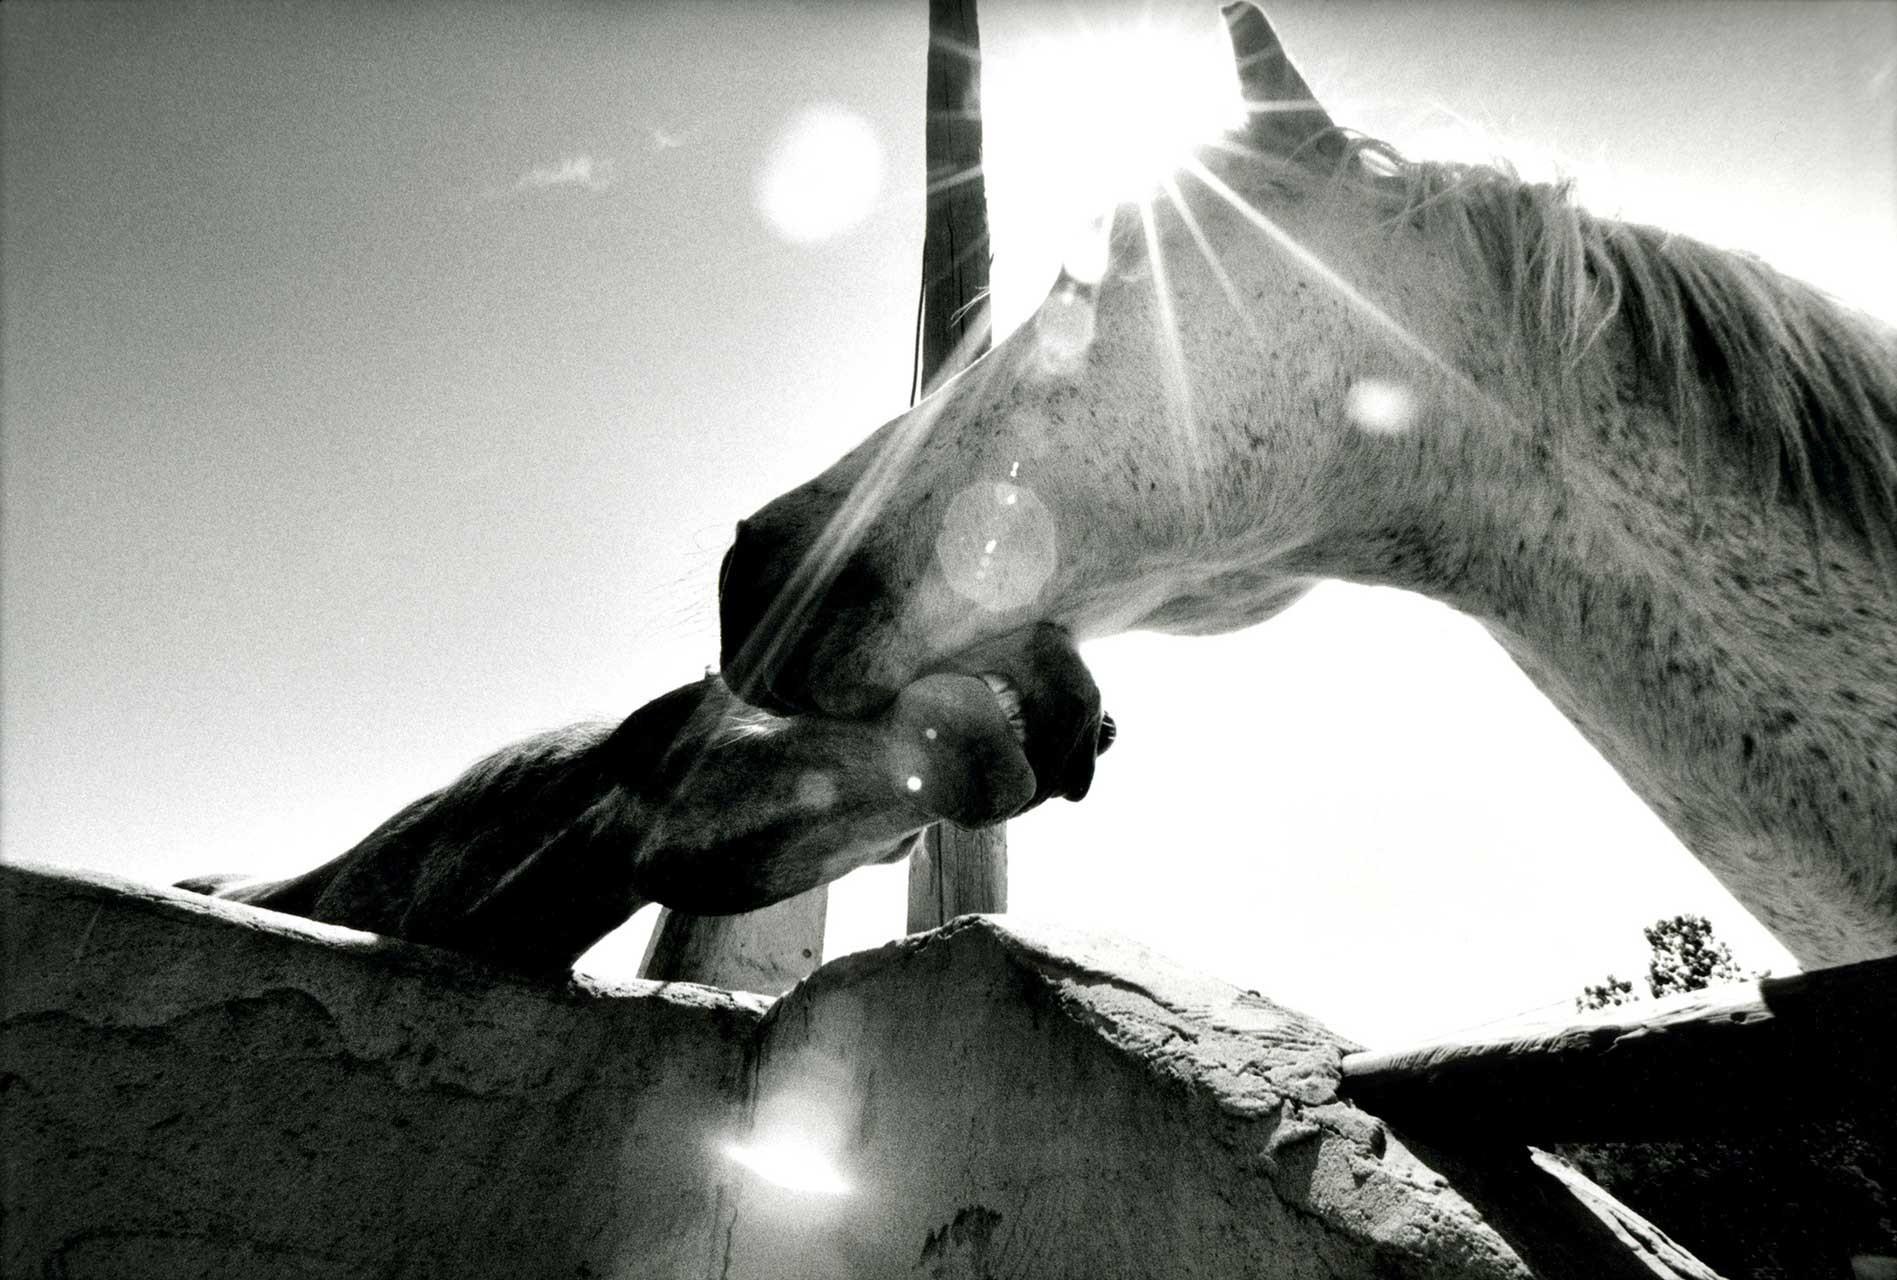 Laure-Maud_photographe_01_chevaux-camarguais_02